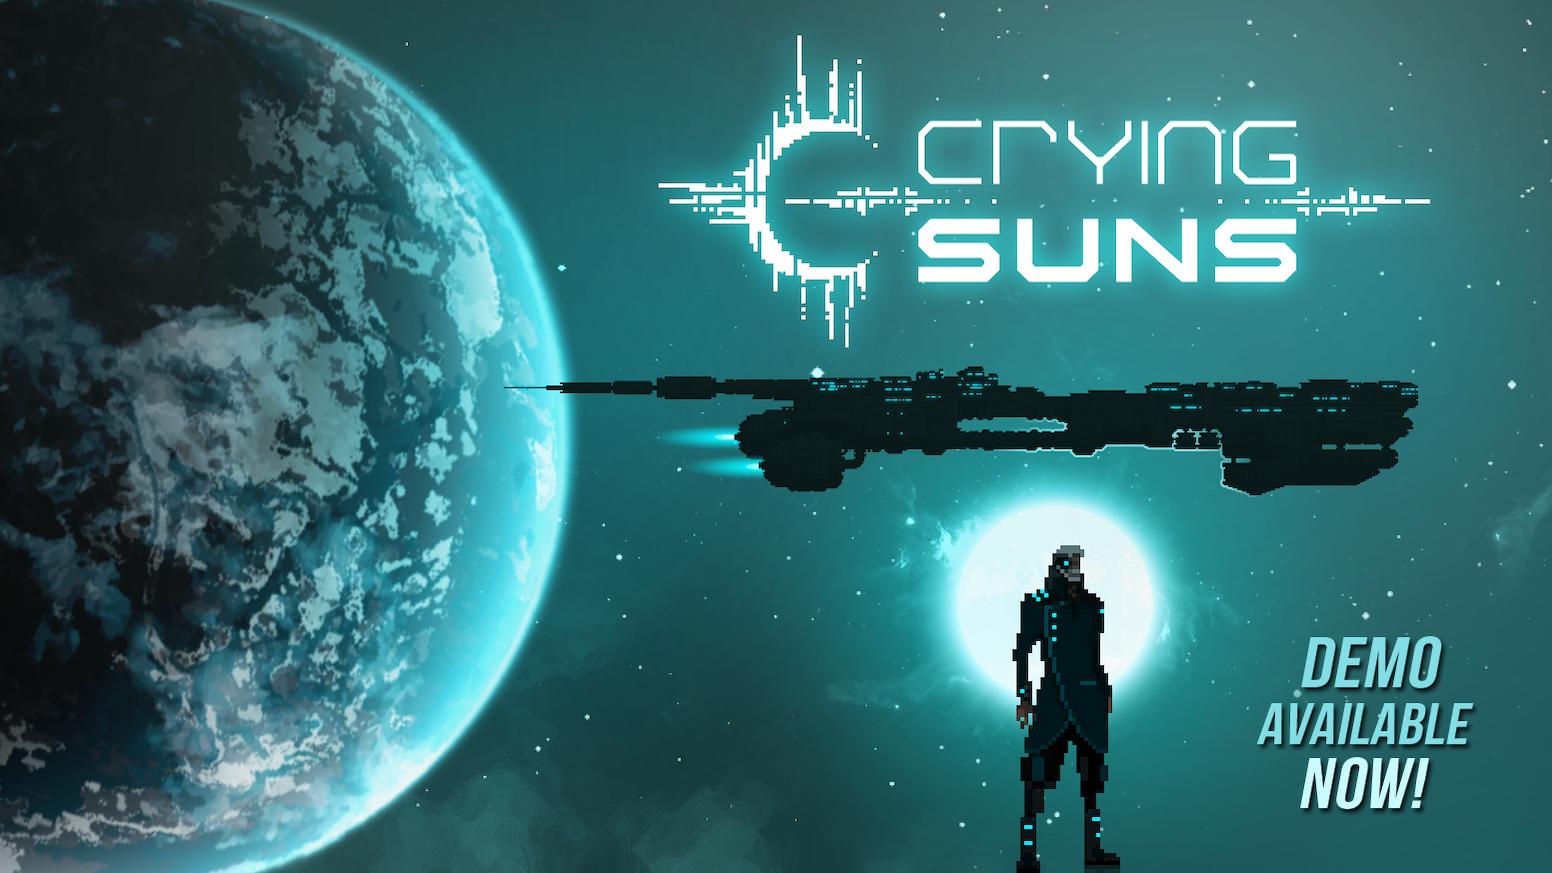 Crying Suns by Alt Shift » 80 % / Reddit & Steam / Beta / Stretch